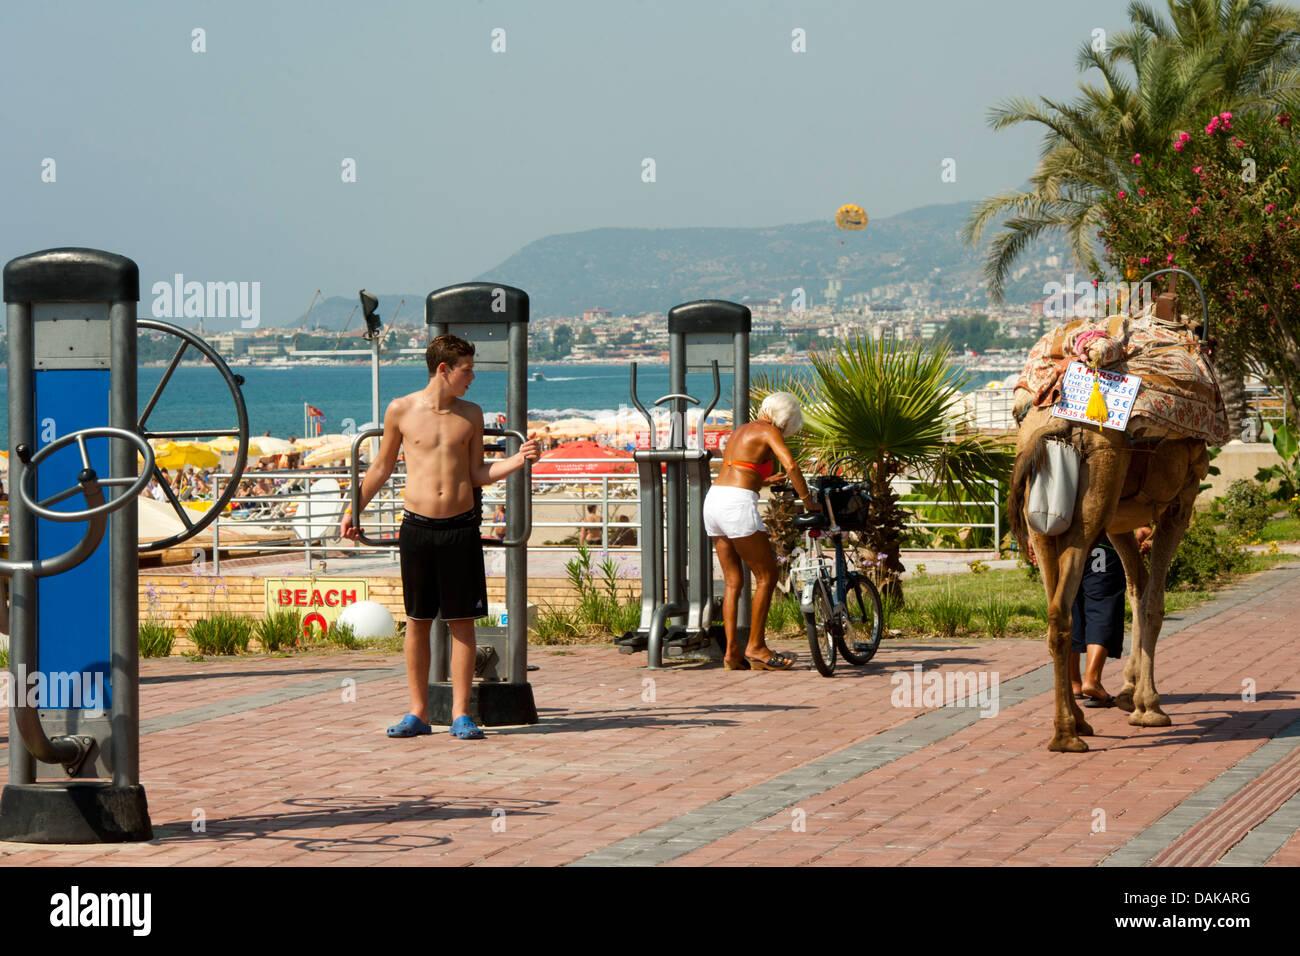 Türkei, Provinz Antalya, Alanya, Oststrand Sportanlage an der Strandpromenade - Stock Image